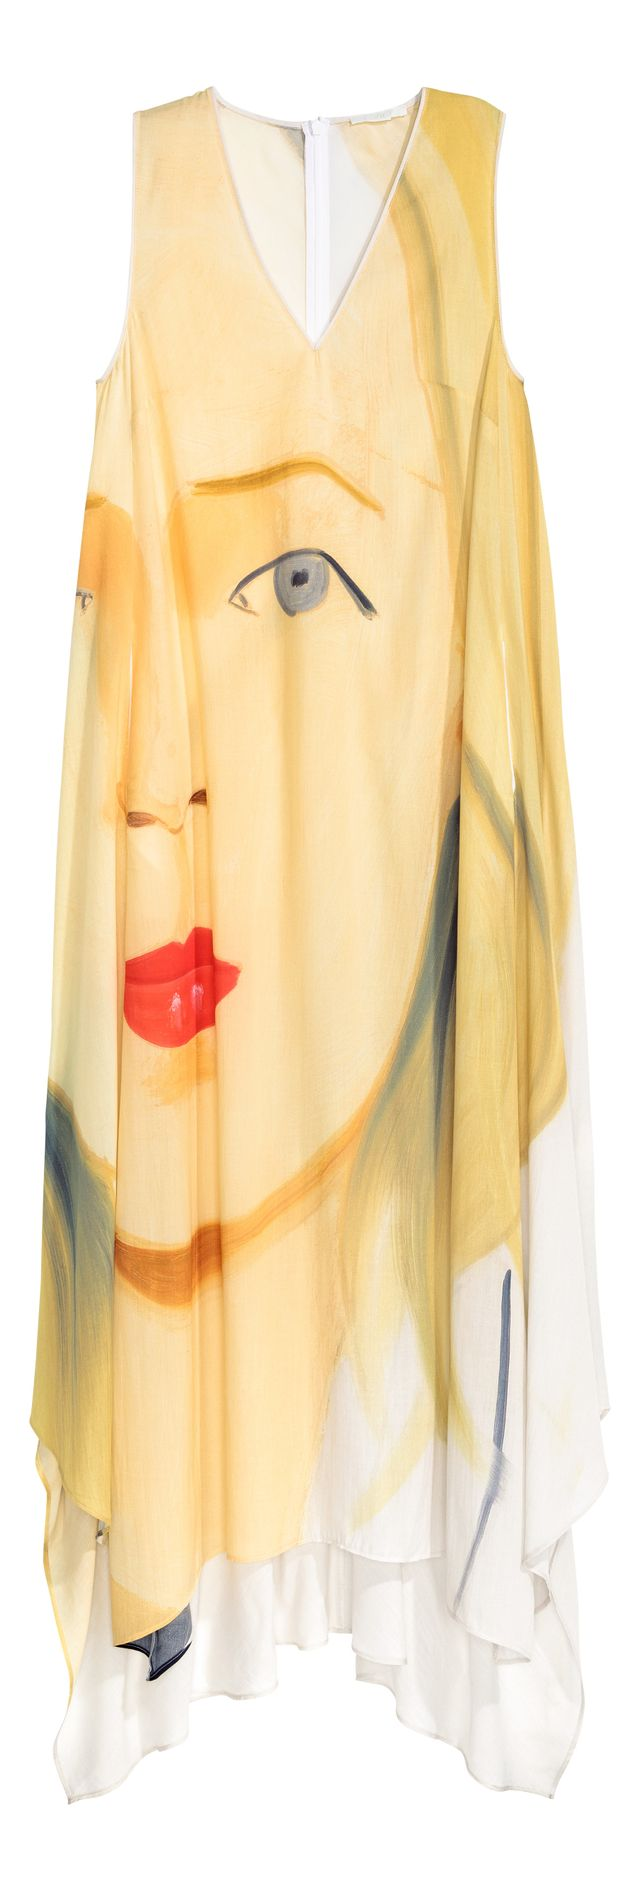 H&M Long Lyocell Dress